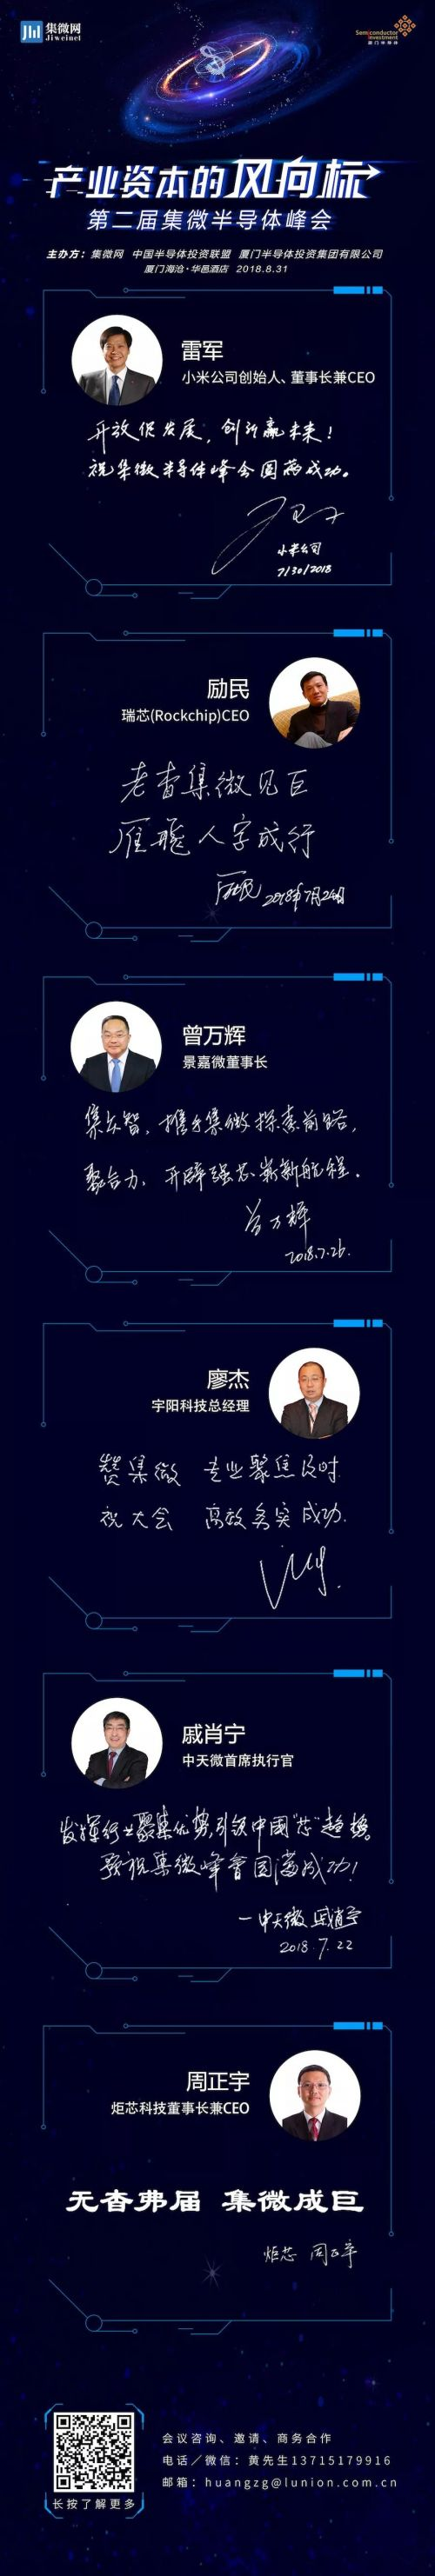 Arm吴雄昂、黄汪、石磊、张世龙、林永育寄语峰会9